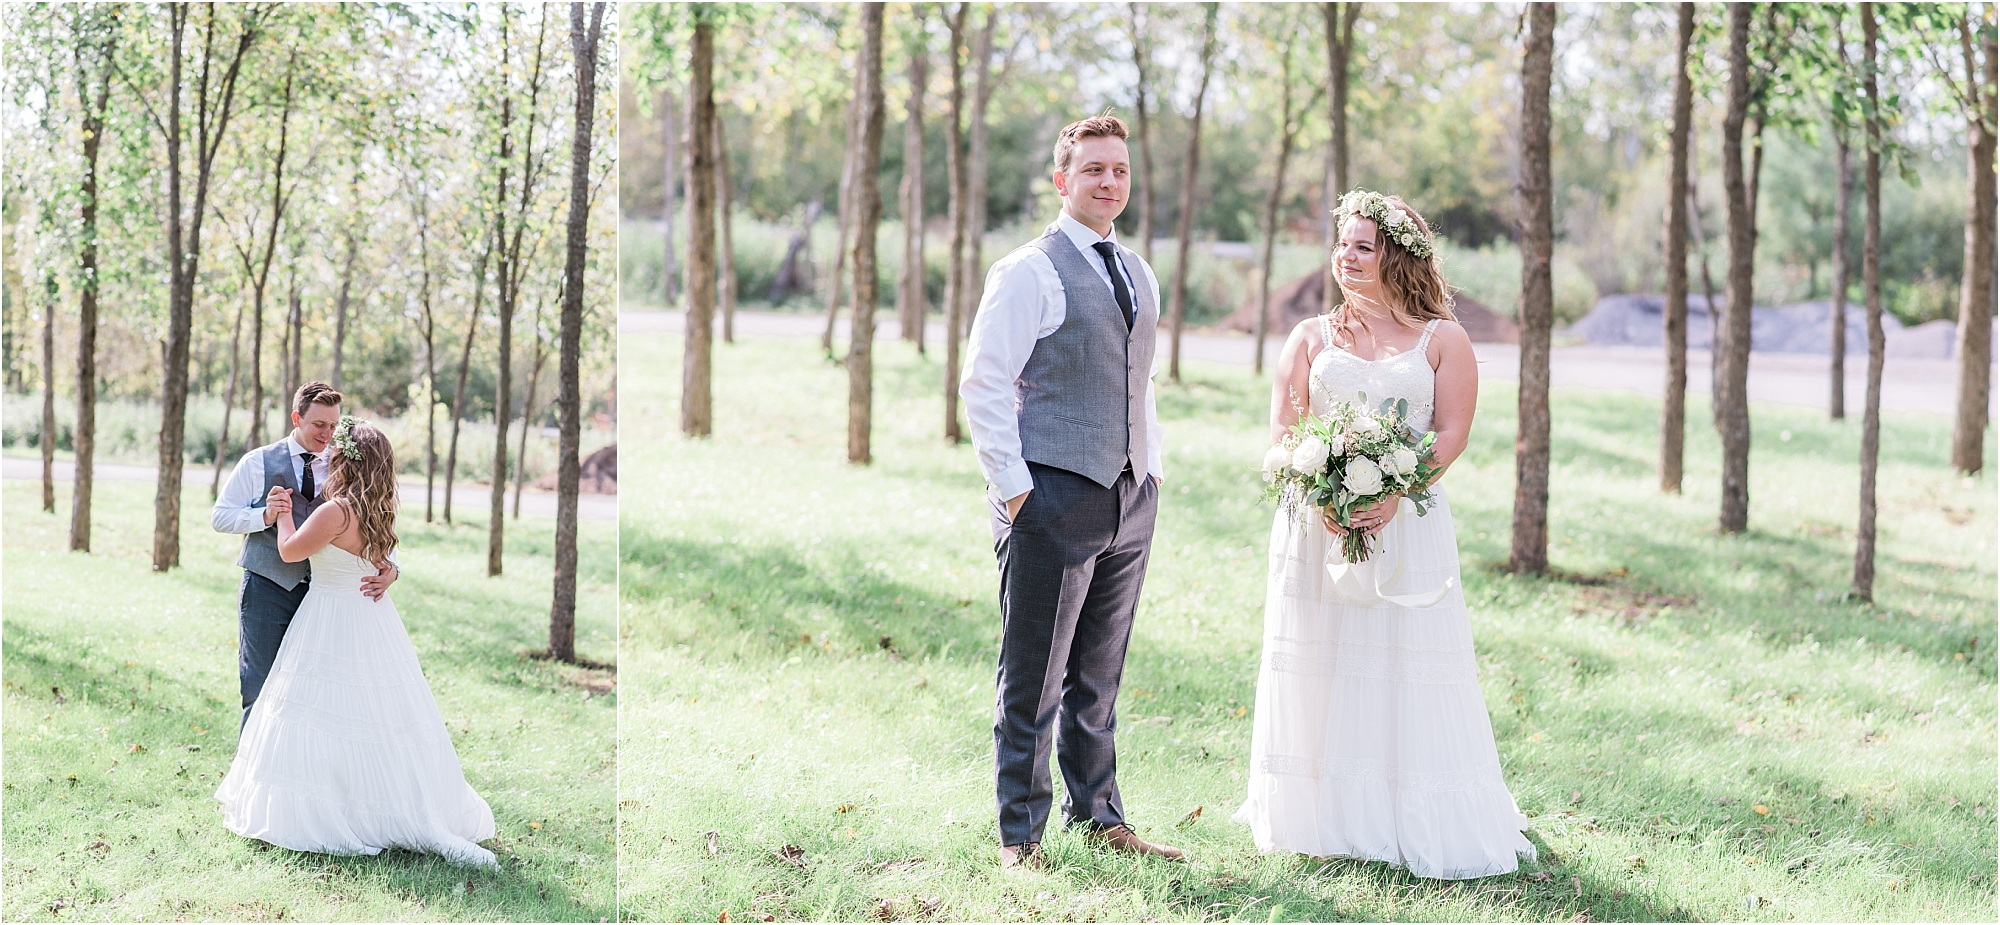 0046 Summer Stonefields Wedding Carleton Place - Ottawa Wedding - Photography by Emma_WEB.jpg